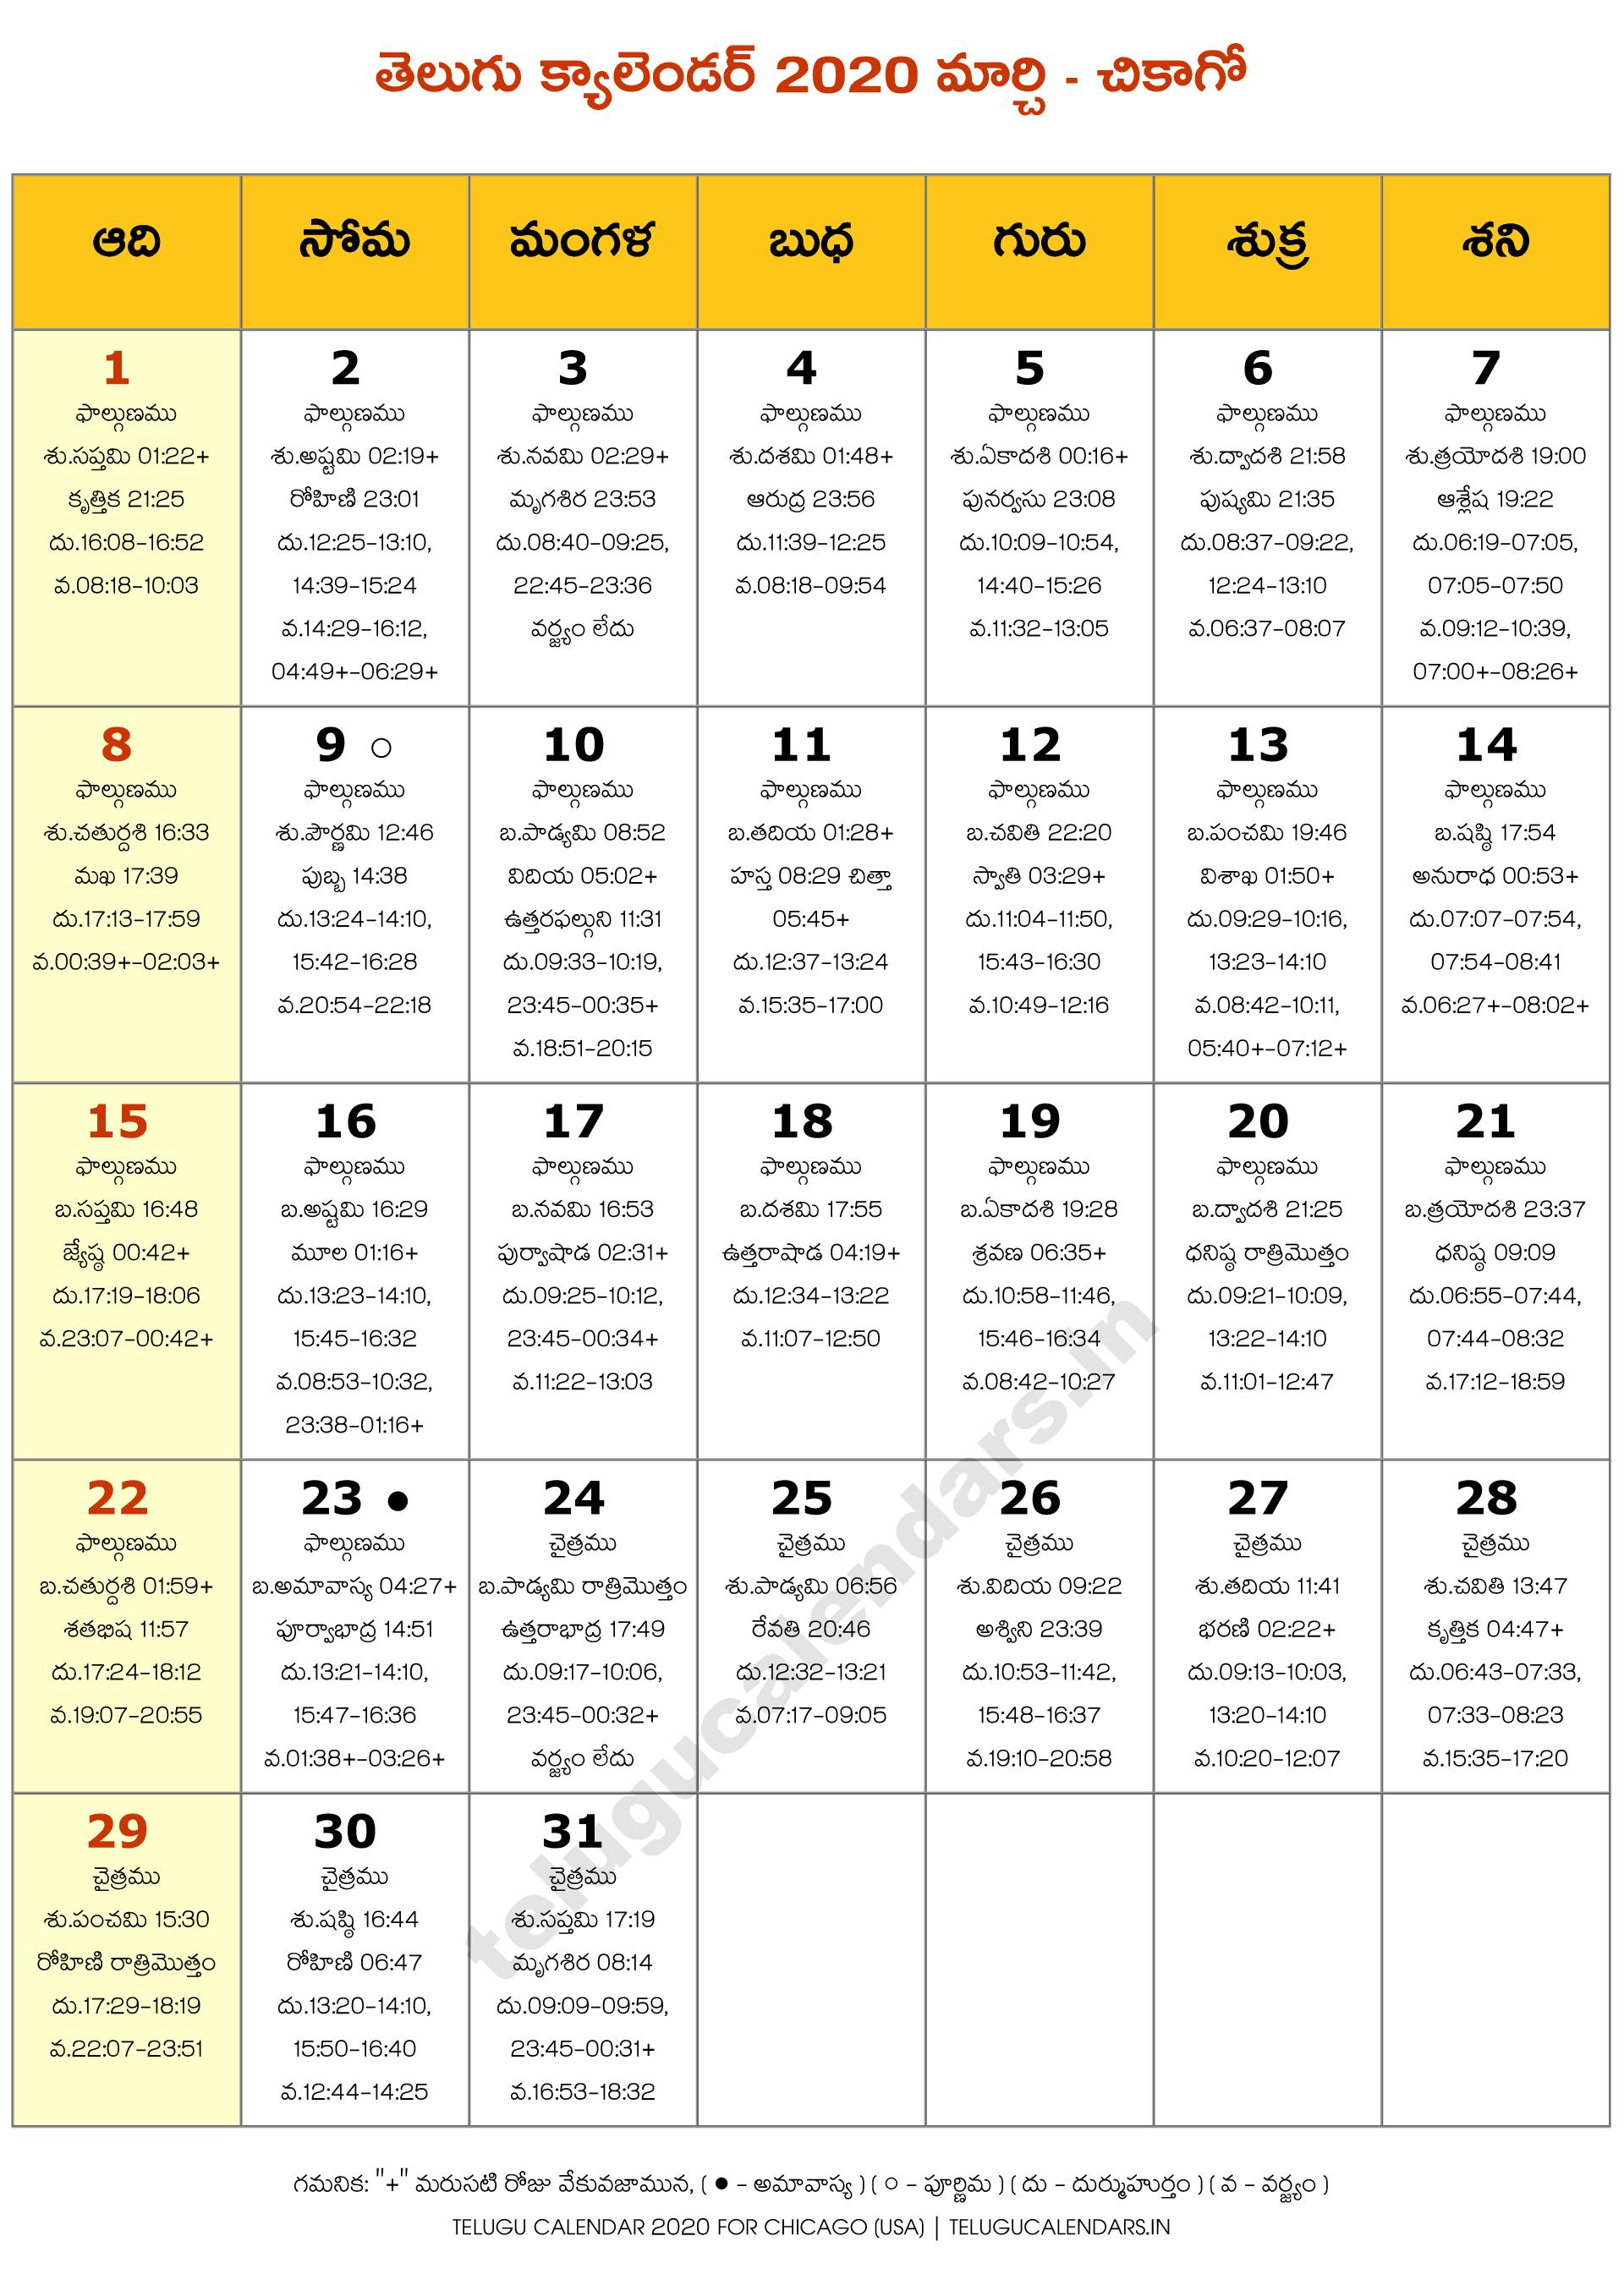 Chicago Telugu Calendar 2022.Telugu Calendar 2020 Chicago